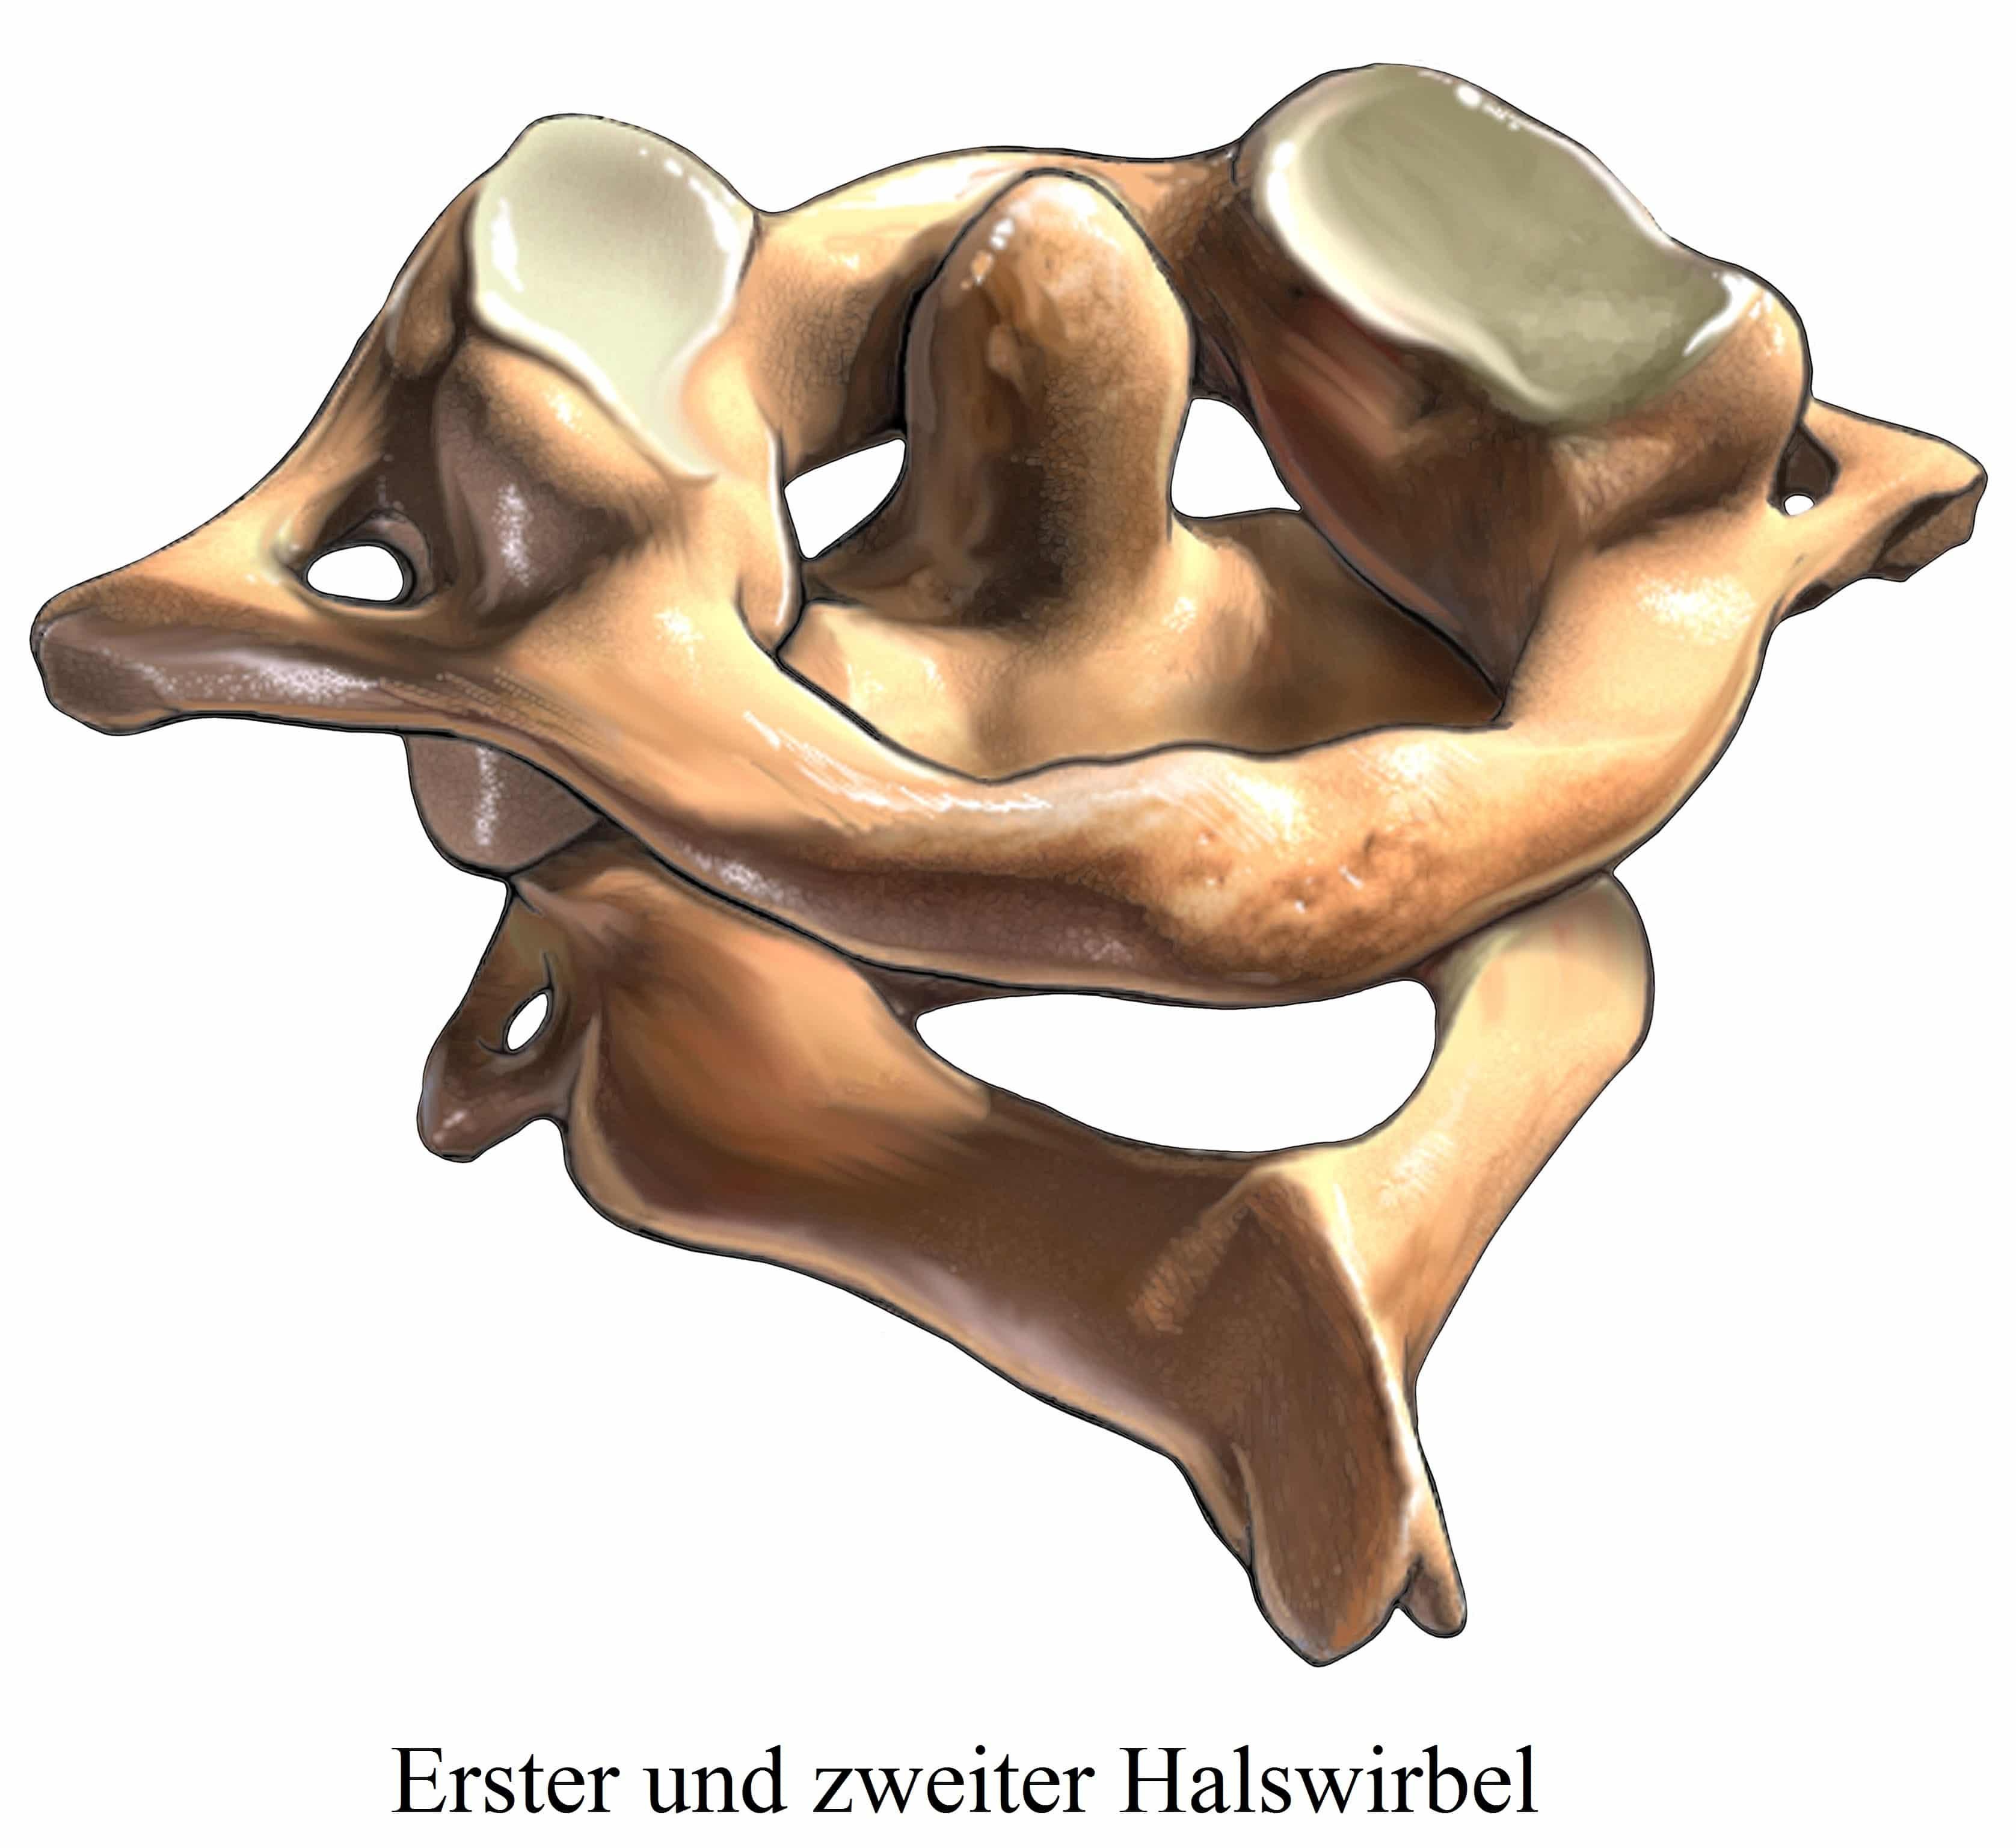 Halswirbel